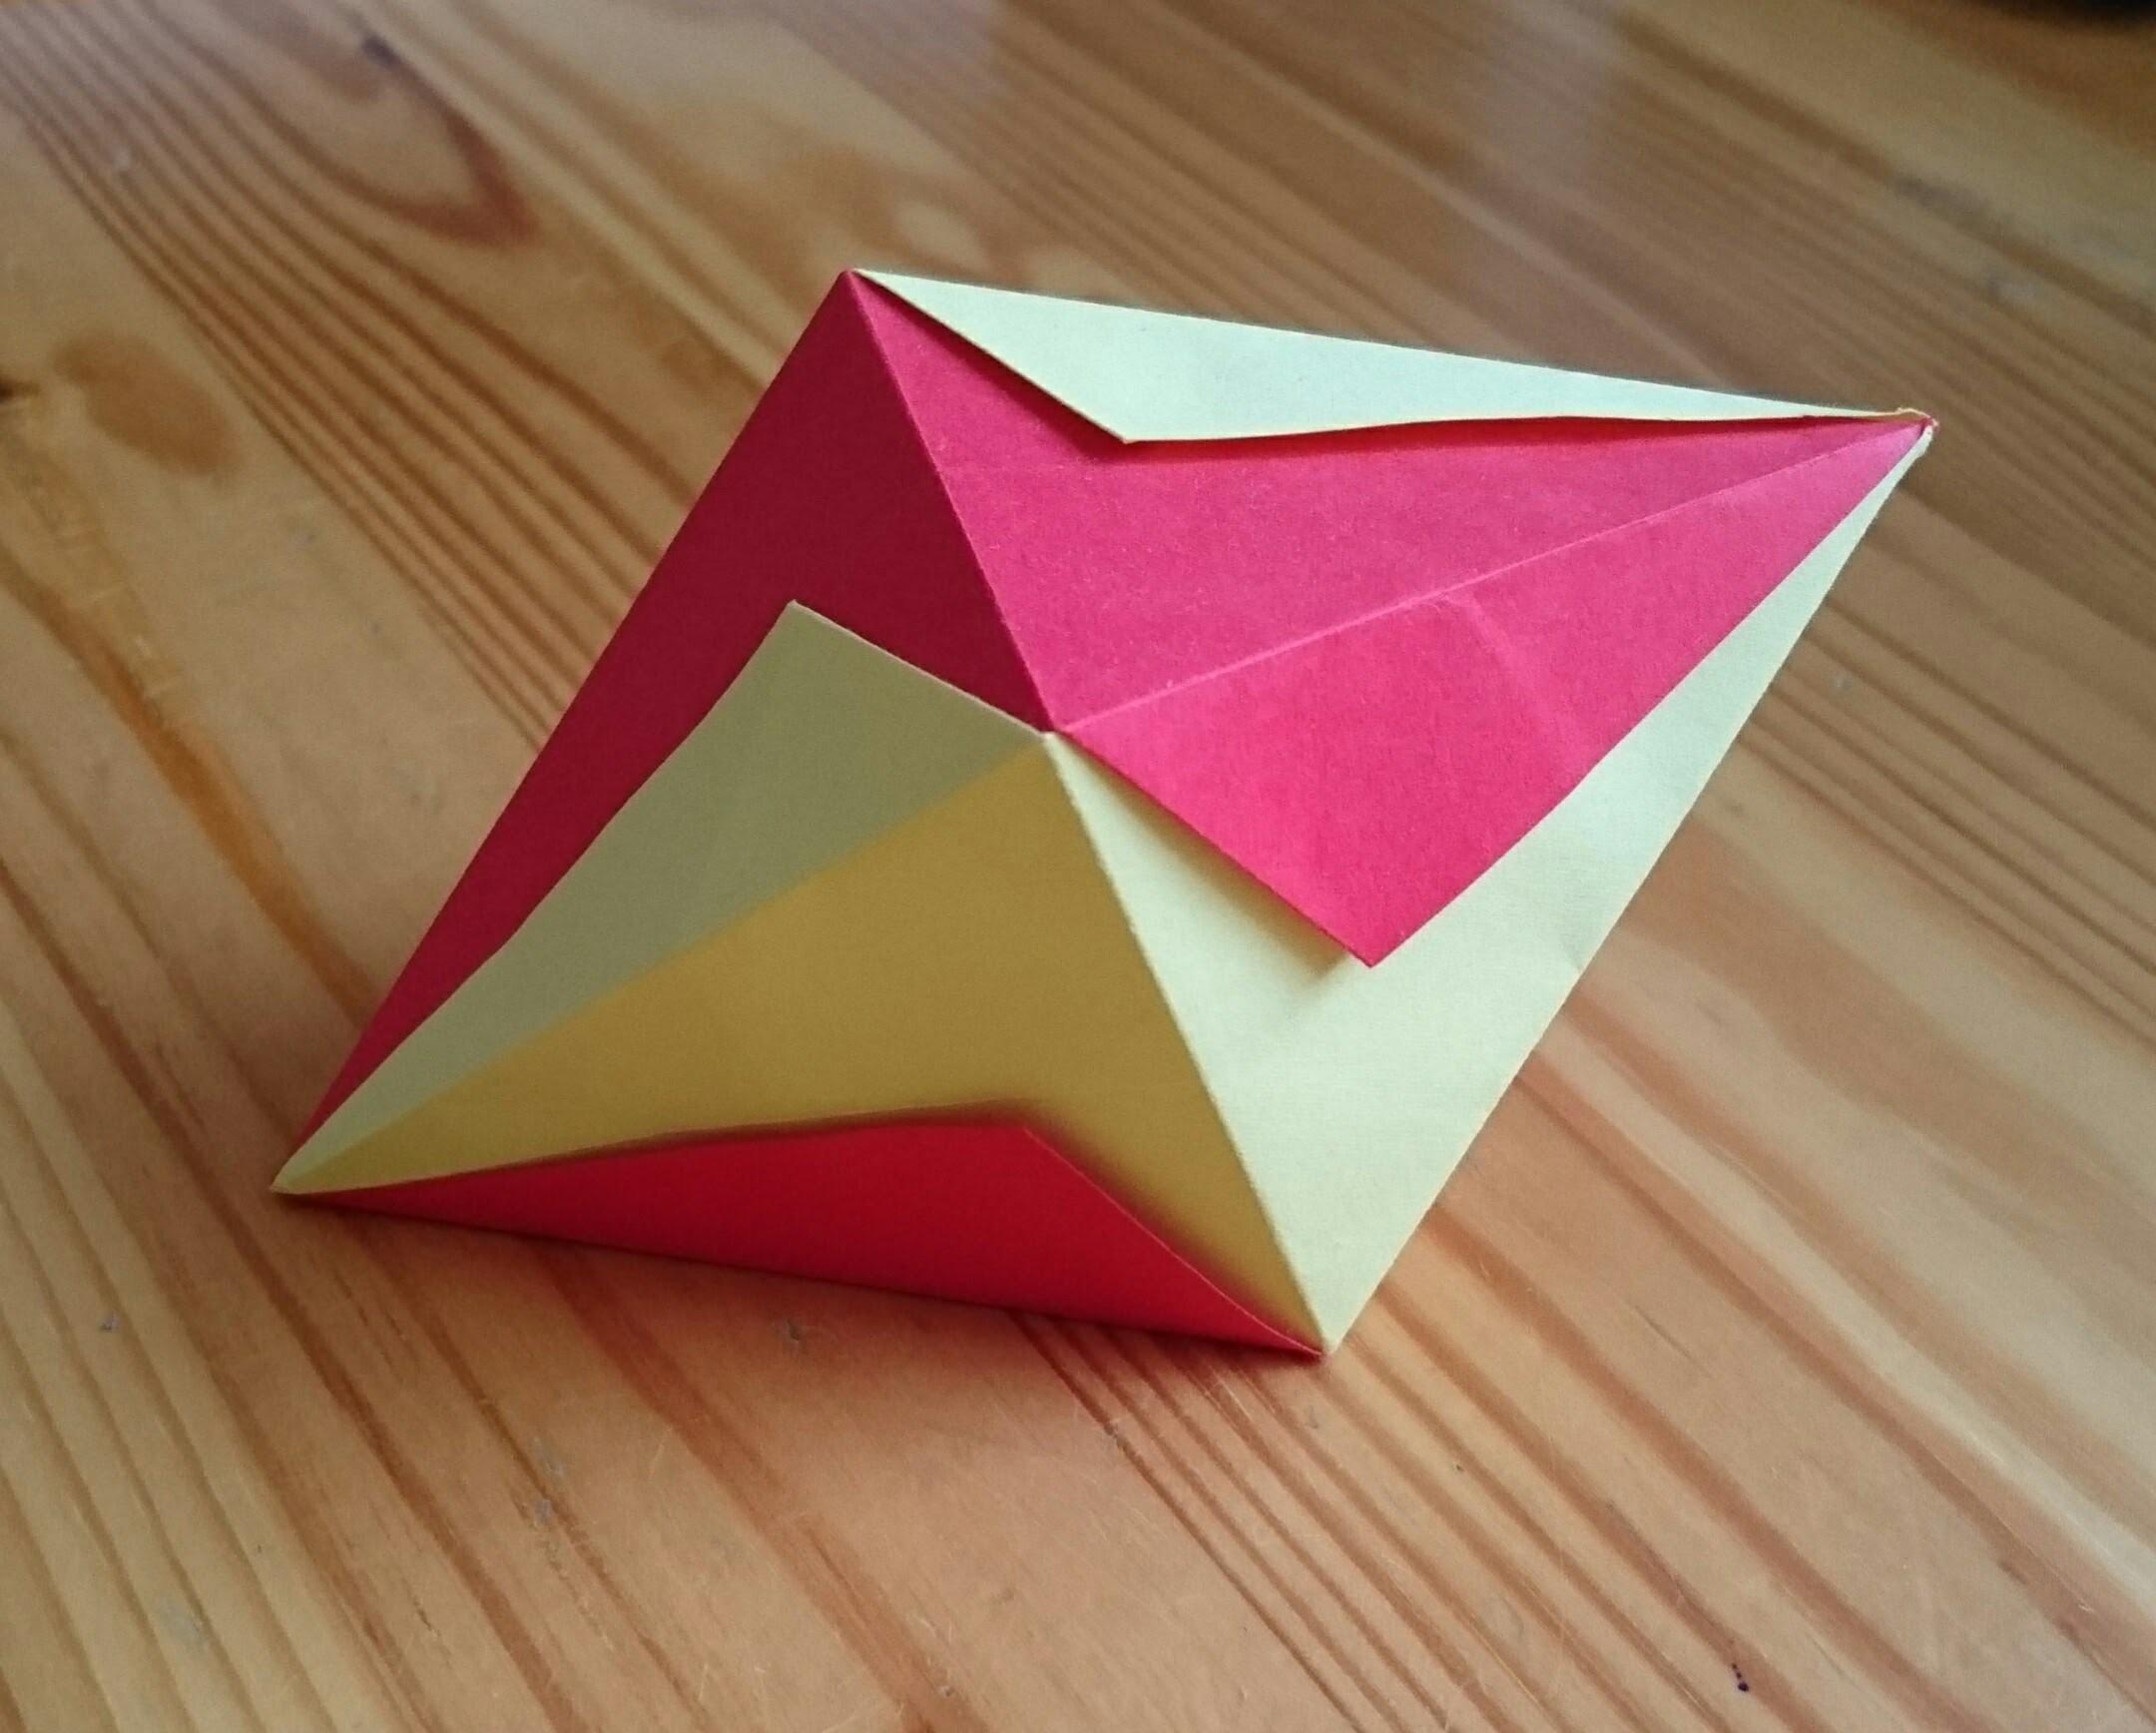 origami origami santa bookmark origami valentinsrose valentines rose tutorial hd. Black Bedroom Furniture Sets. Home Design Ideas